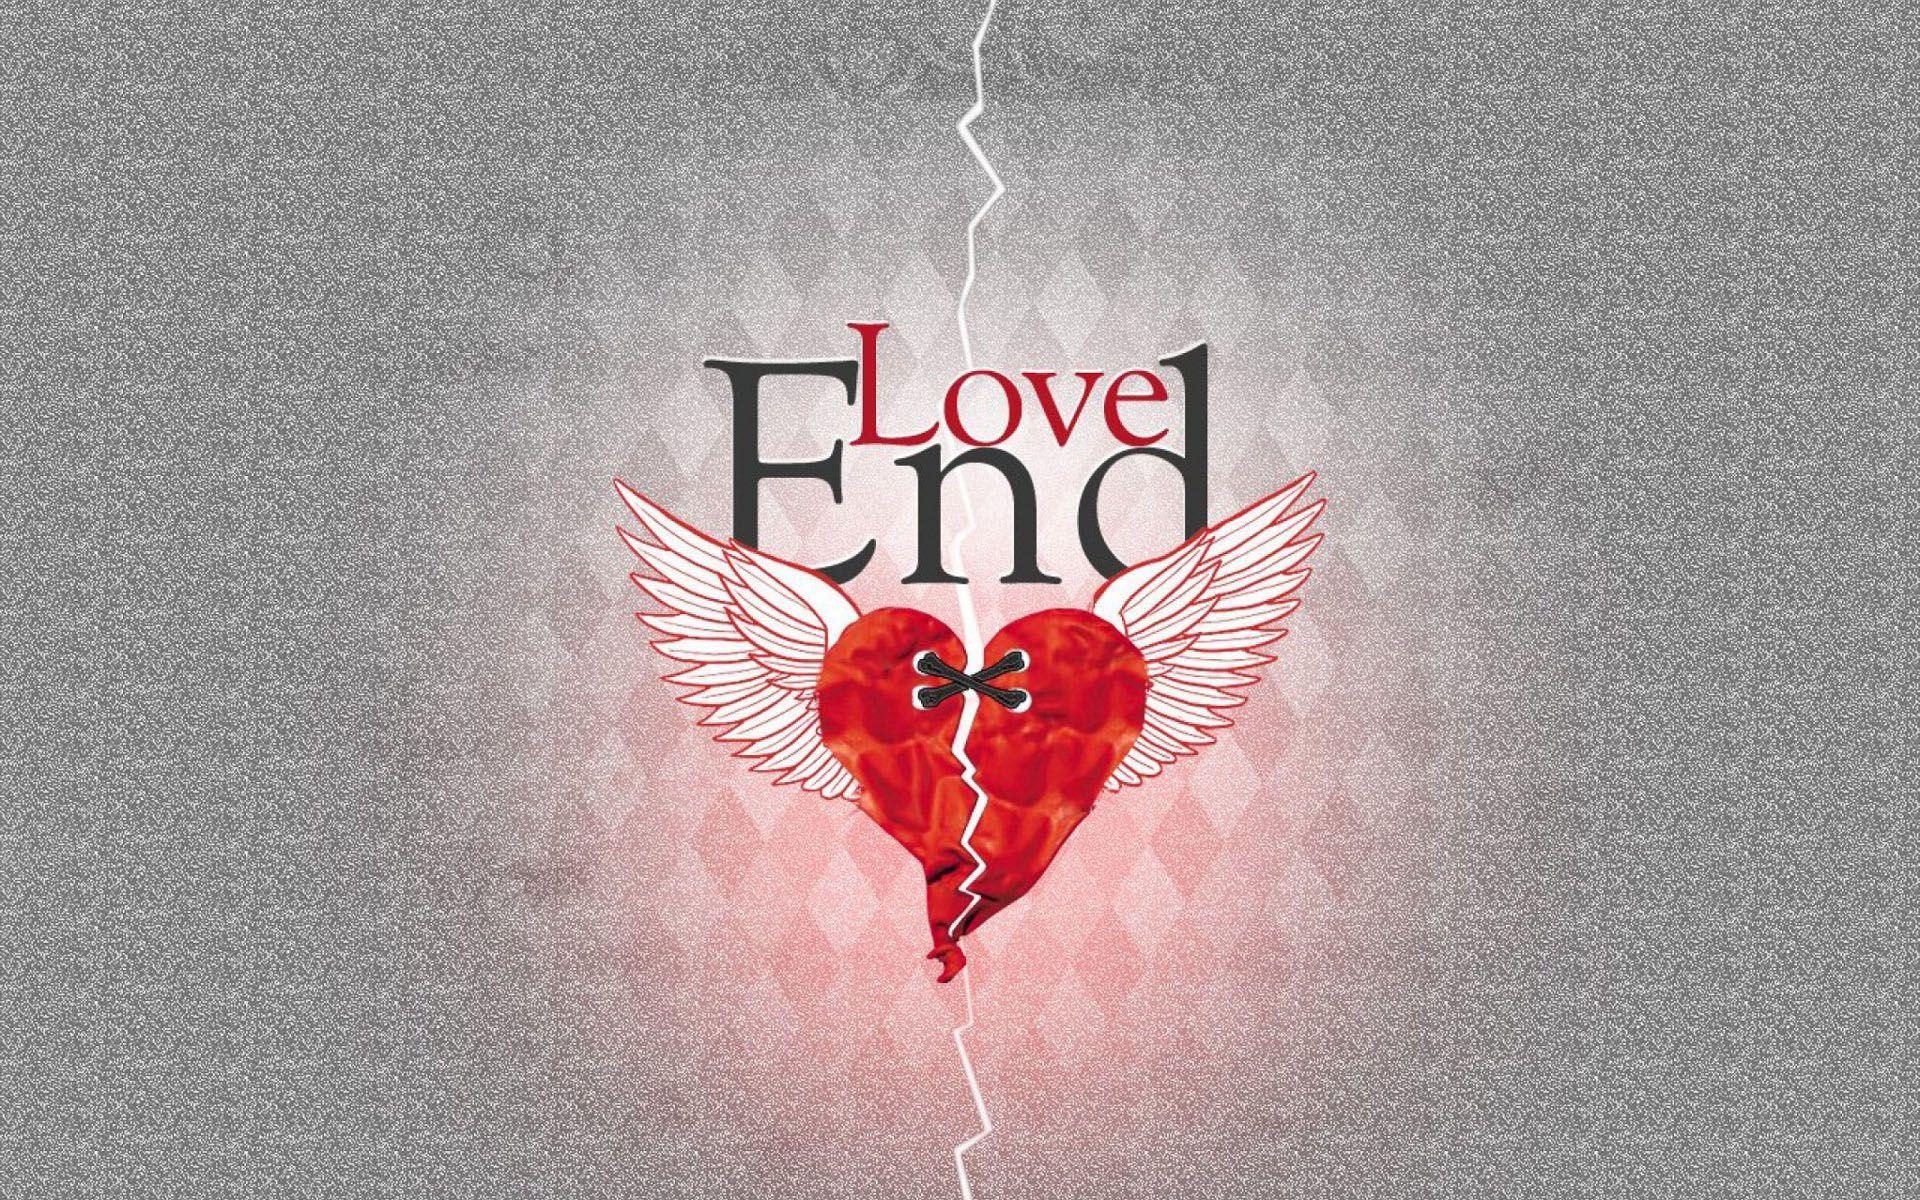 Breakup Images Hd Download Broken Heart Wallpaper Love Wallpaper Love Breakup